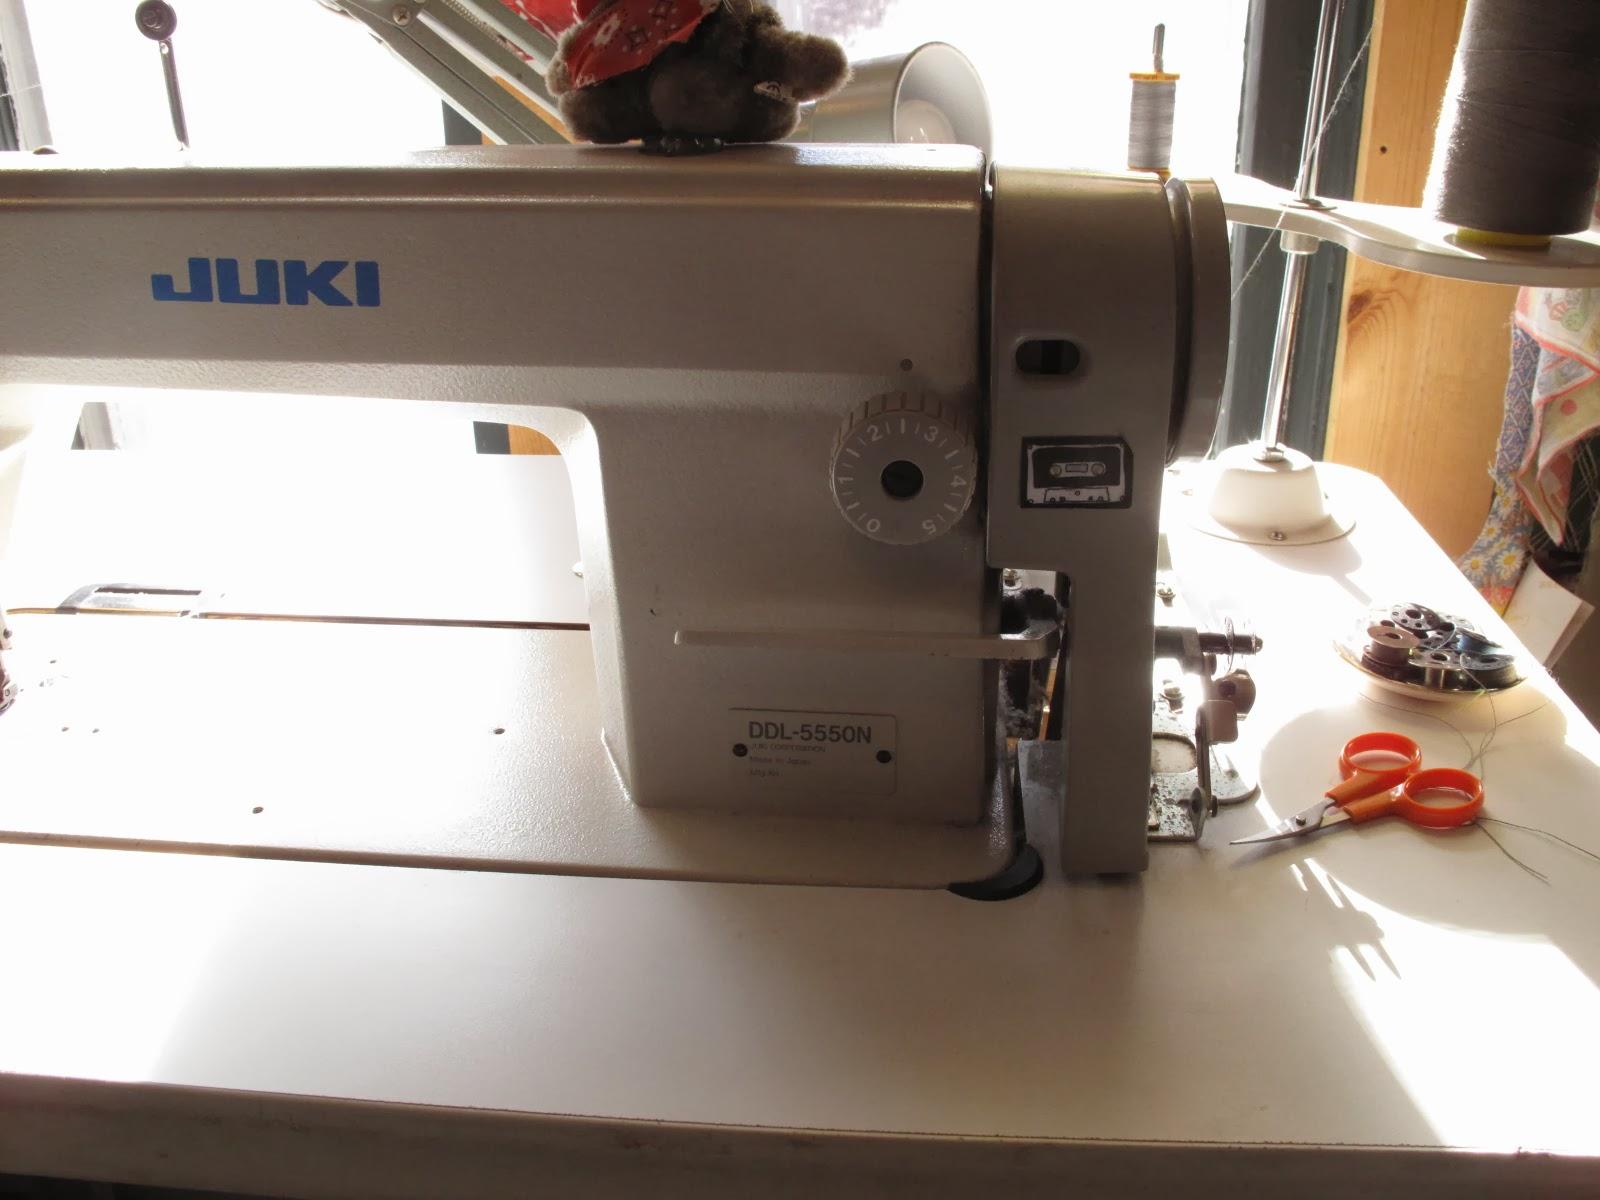 Juki Manual Ebook Toshiba Color Tv 34hf85 Service Array Rh Tiptop Solutions